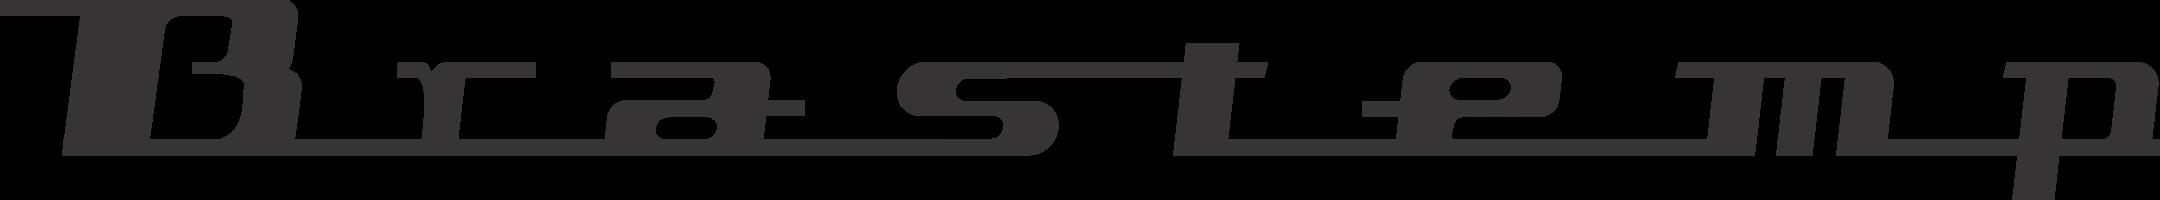 brastemp logo retro 1 - Brastemp Logo (Retro)